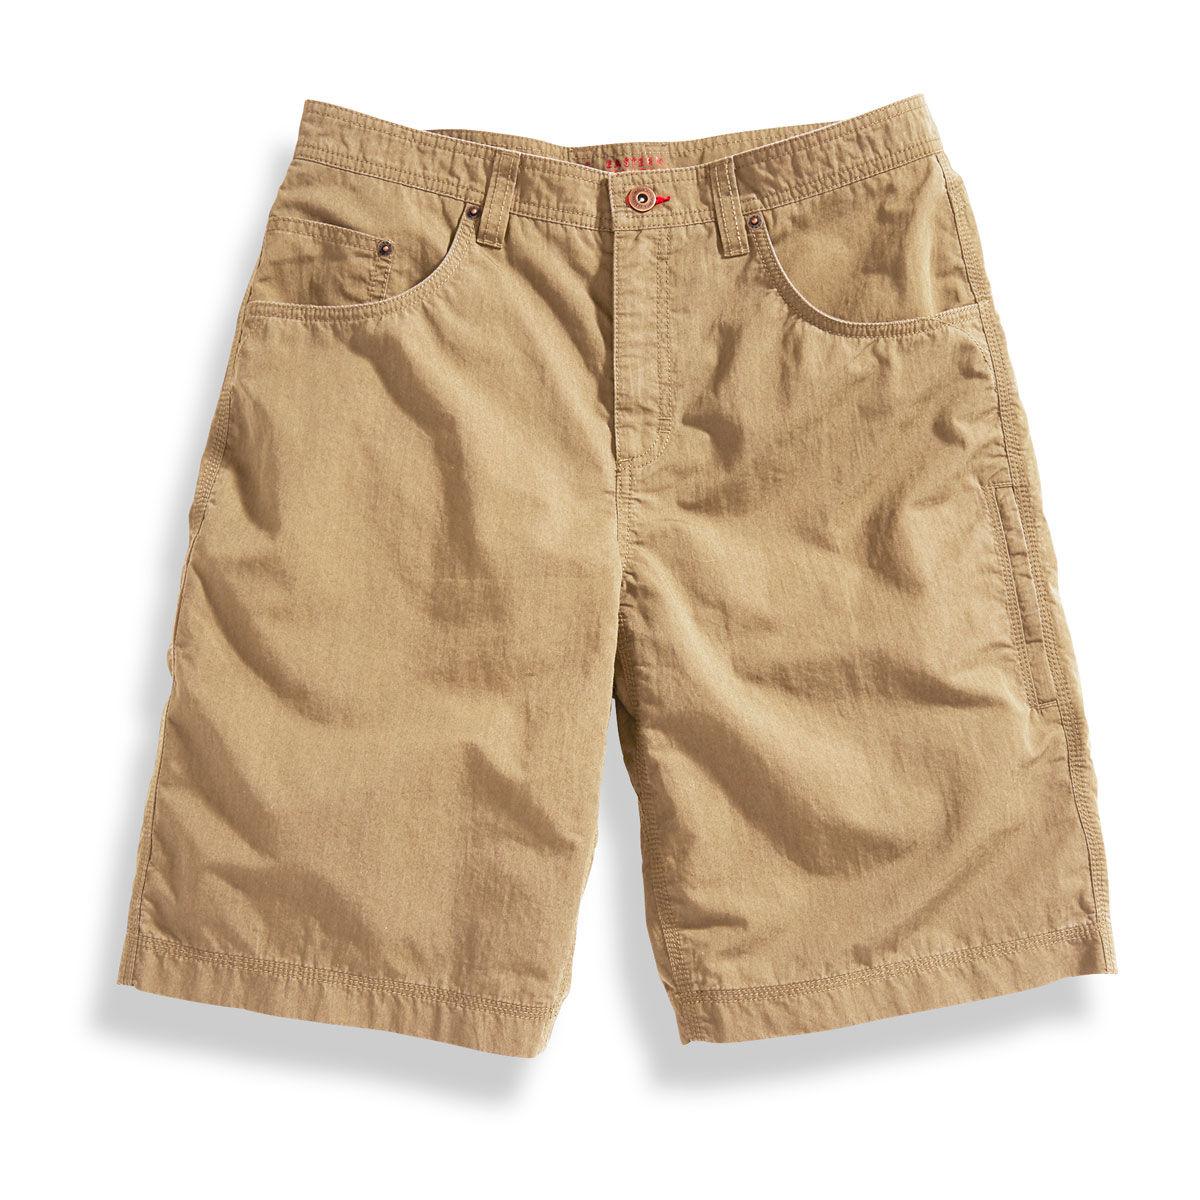 EMS Fencemender Cotton Nylon Short